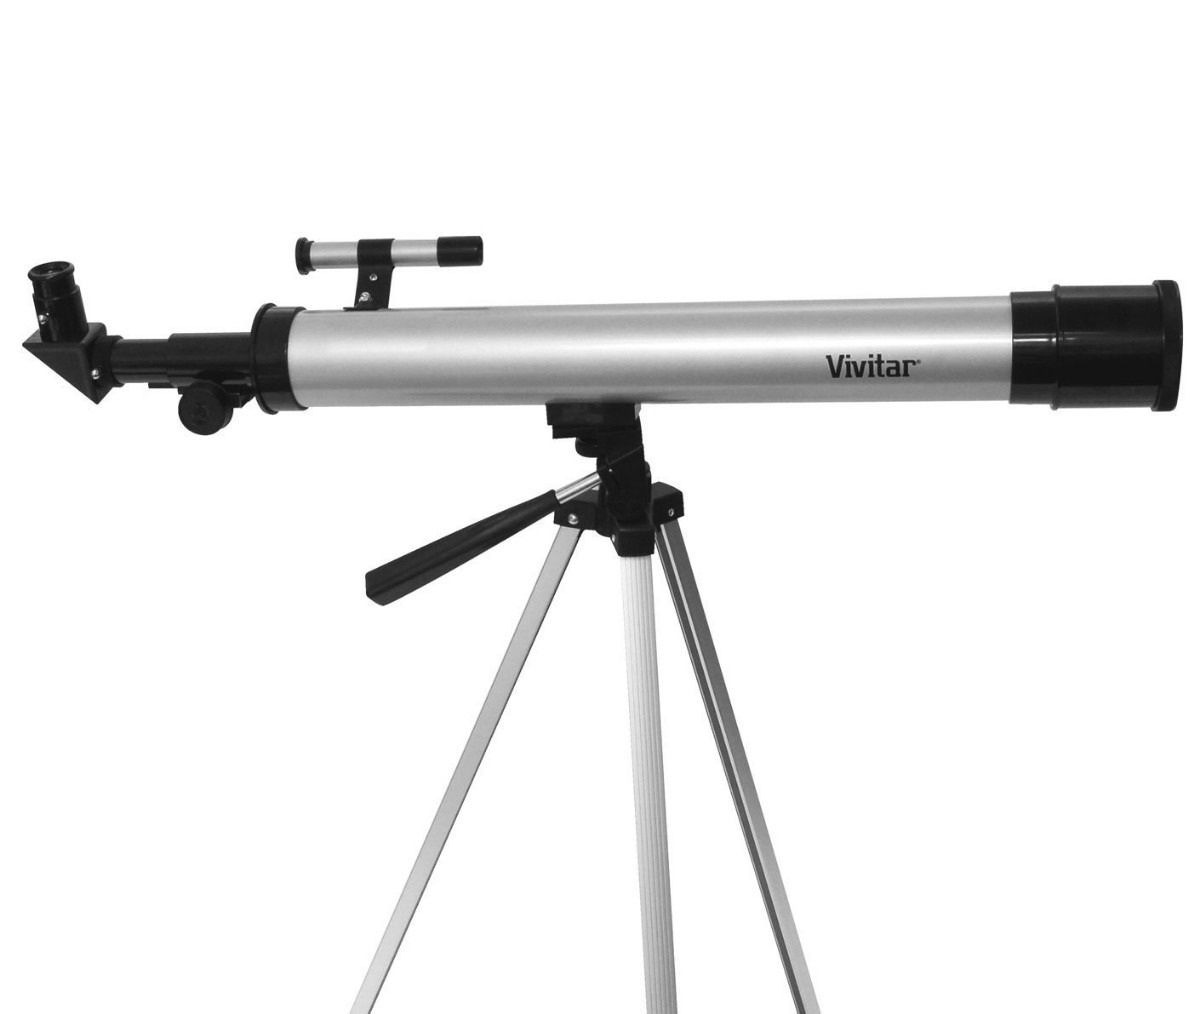 super-telescopio-vivitar-tel50600-60x120x-3395-MLM4148388750_042013-F